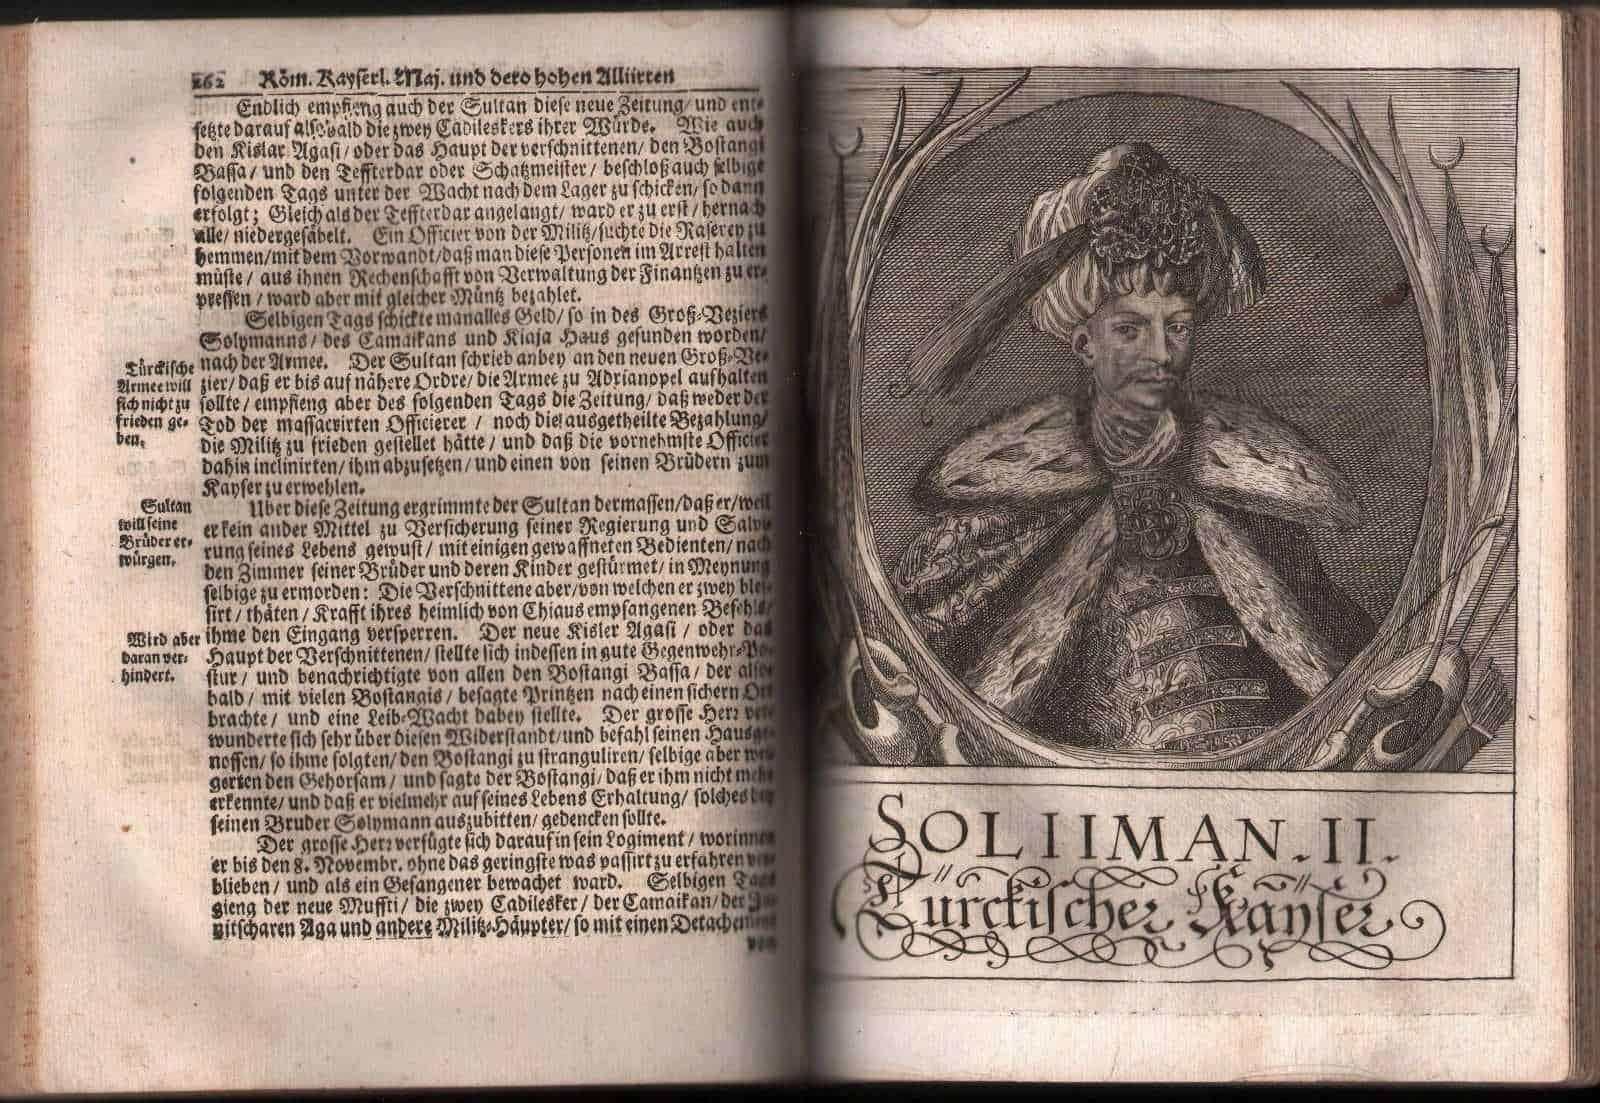 1688-Boethius-TRIUMPH-LEUCHTENDEN-KRIEGS-HELMS-Vol-3-History-Christian-Ottoman-401133054023-2